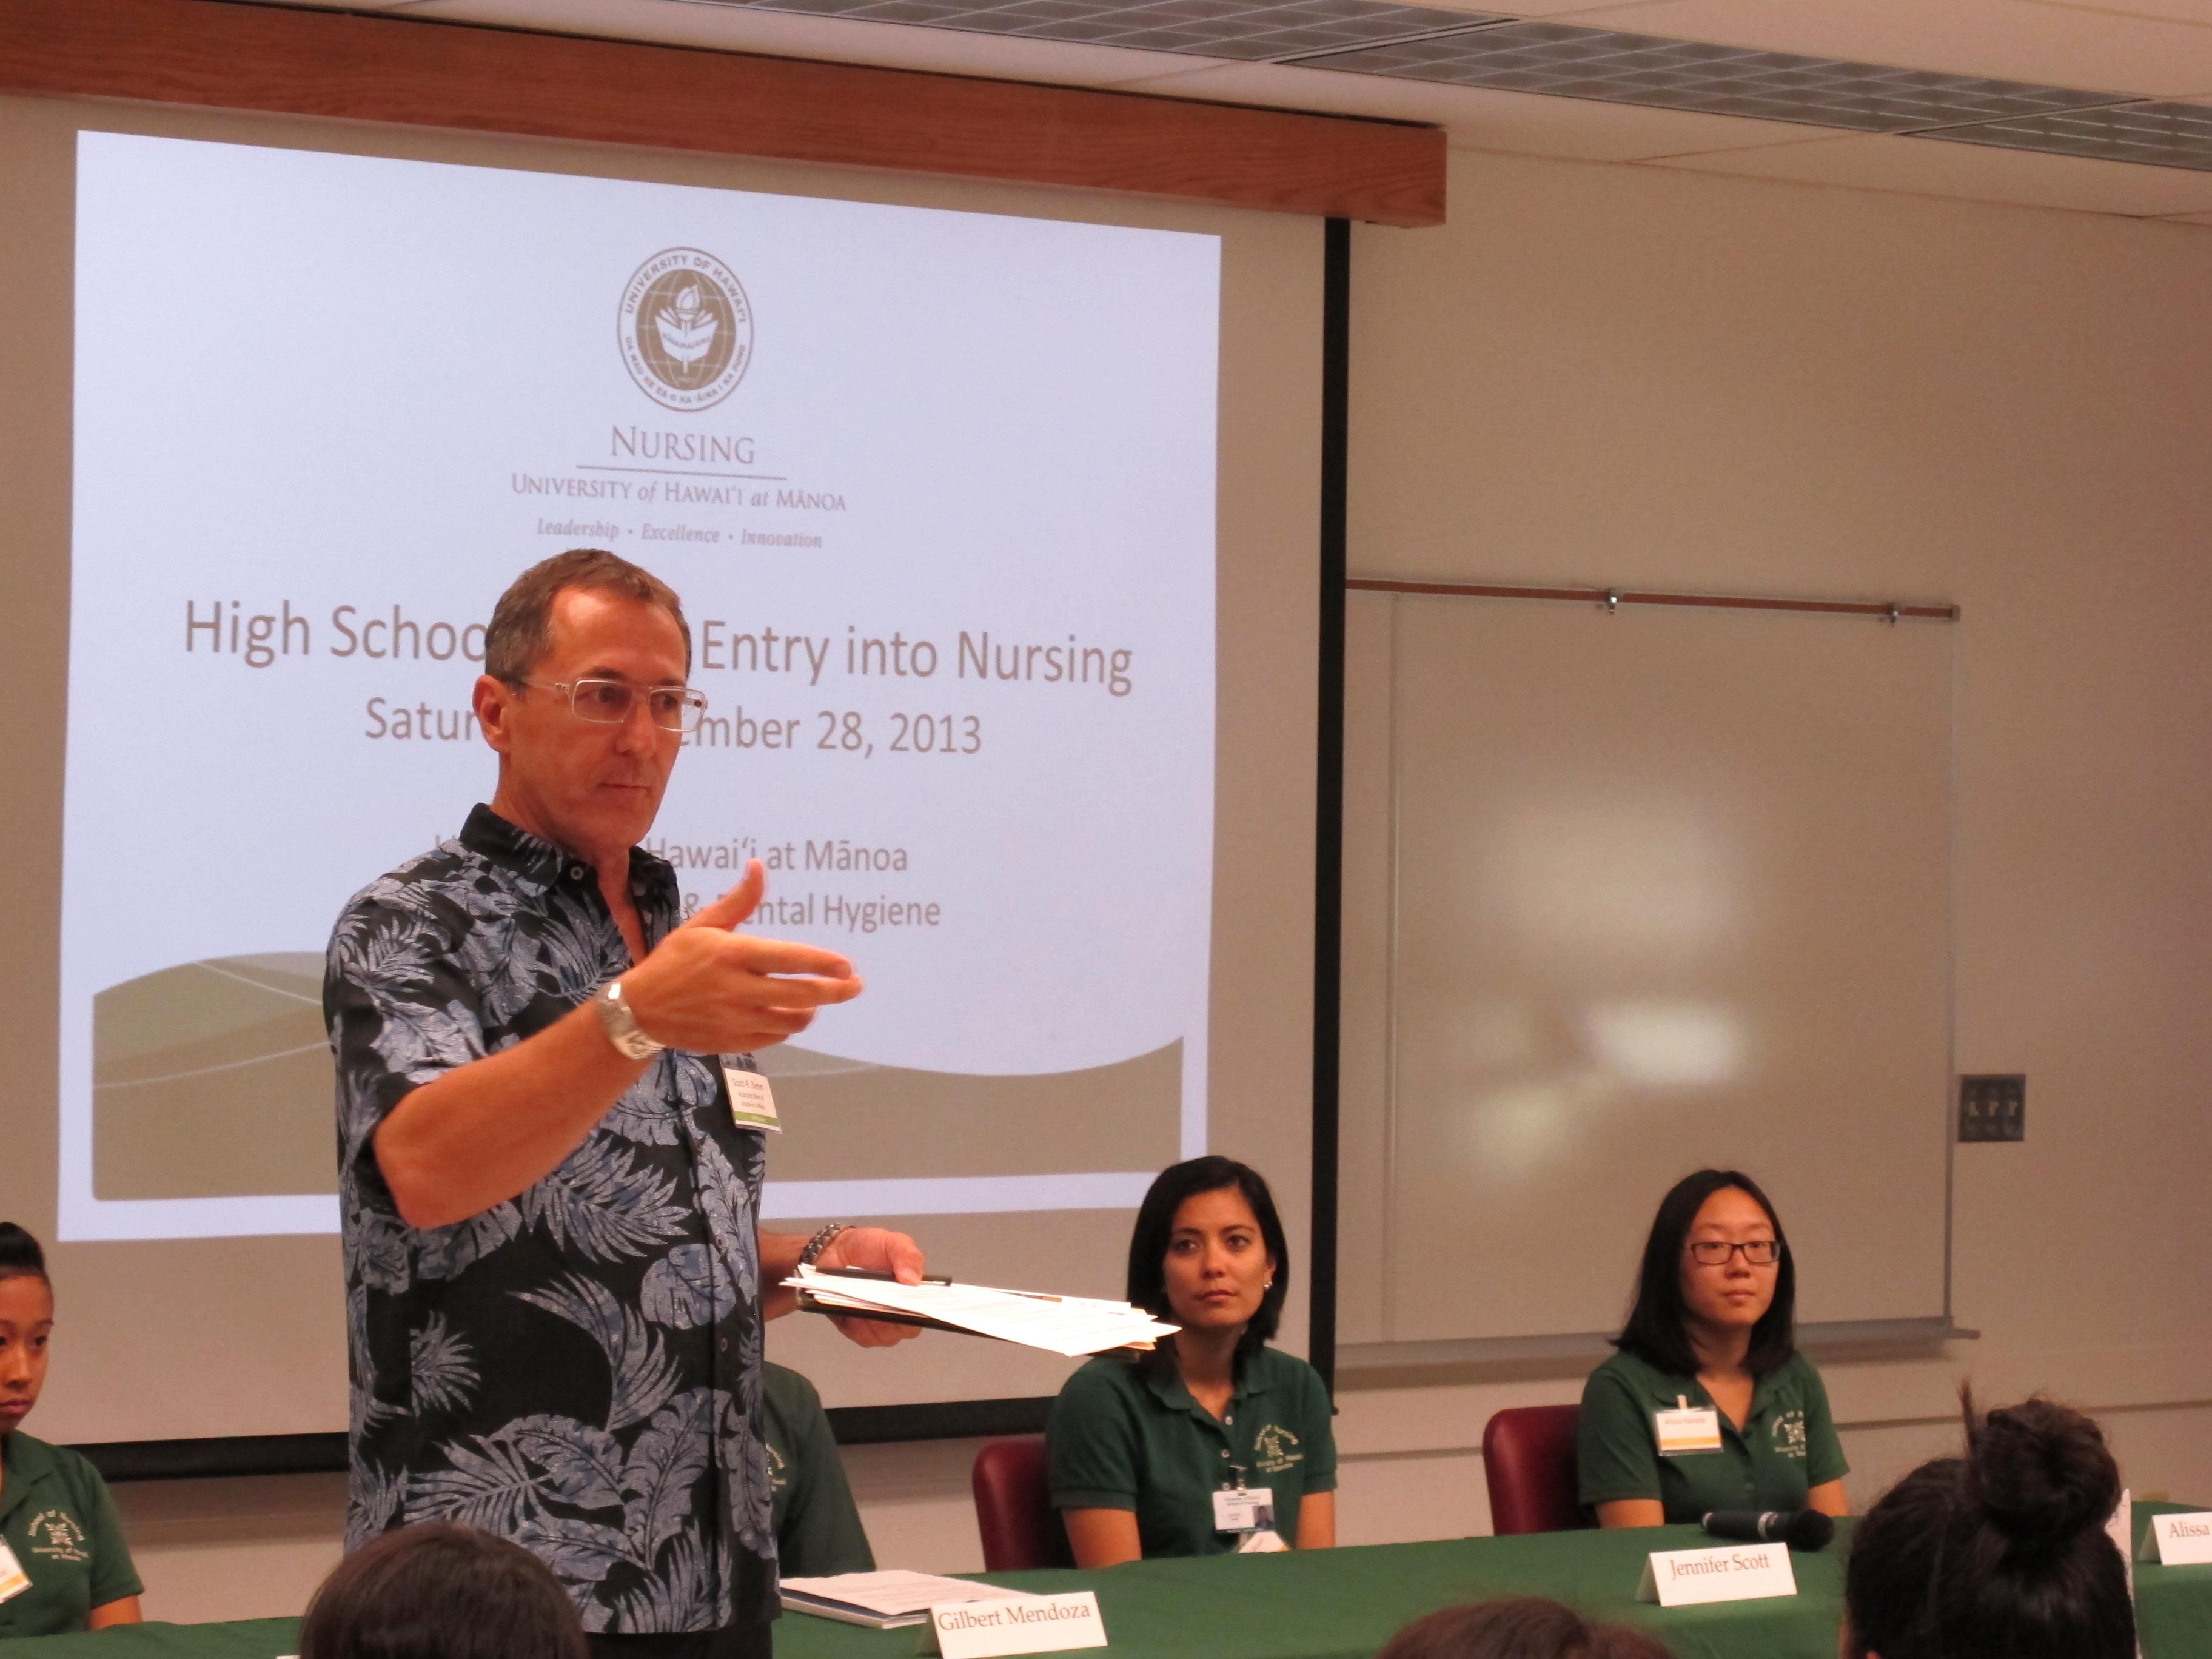 Scott Ziehm gives lecture